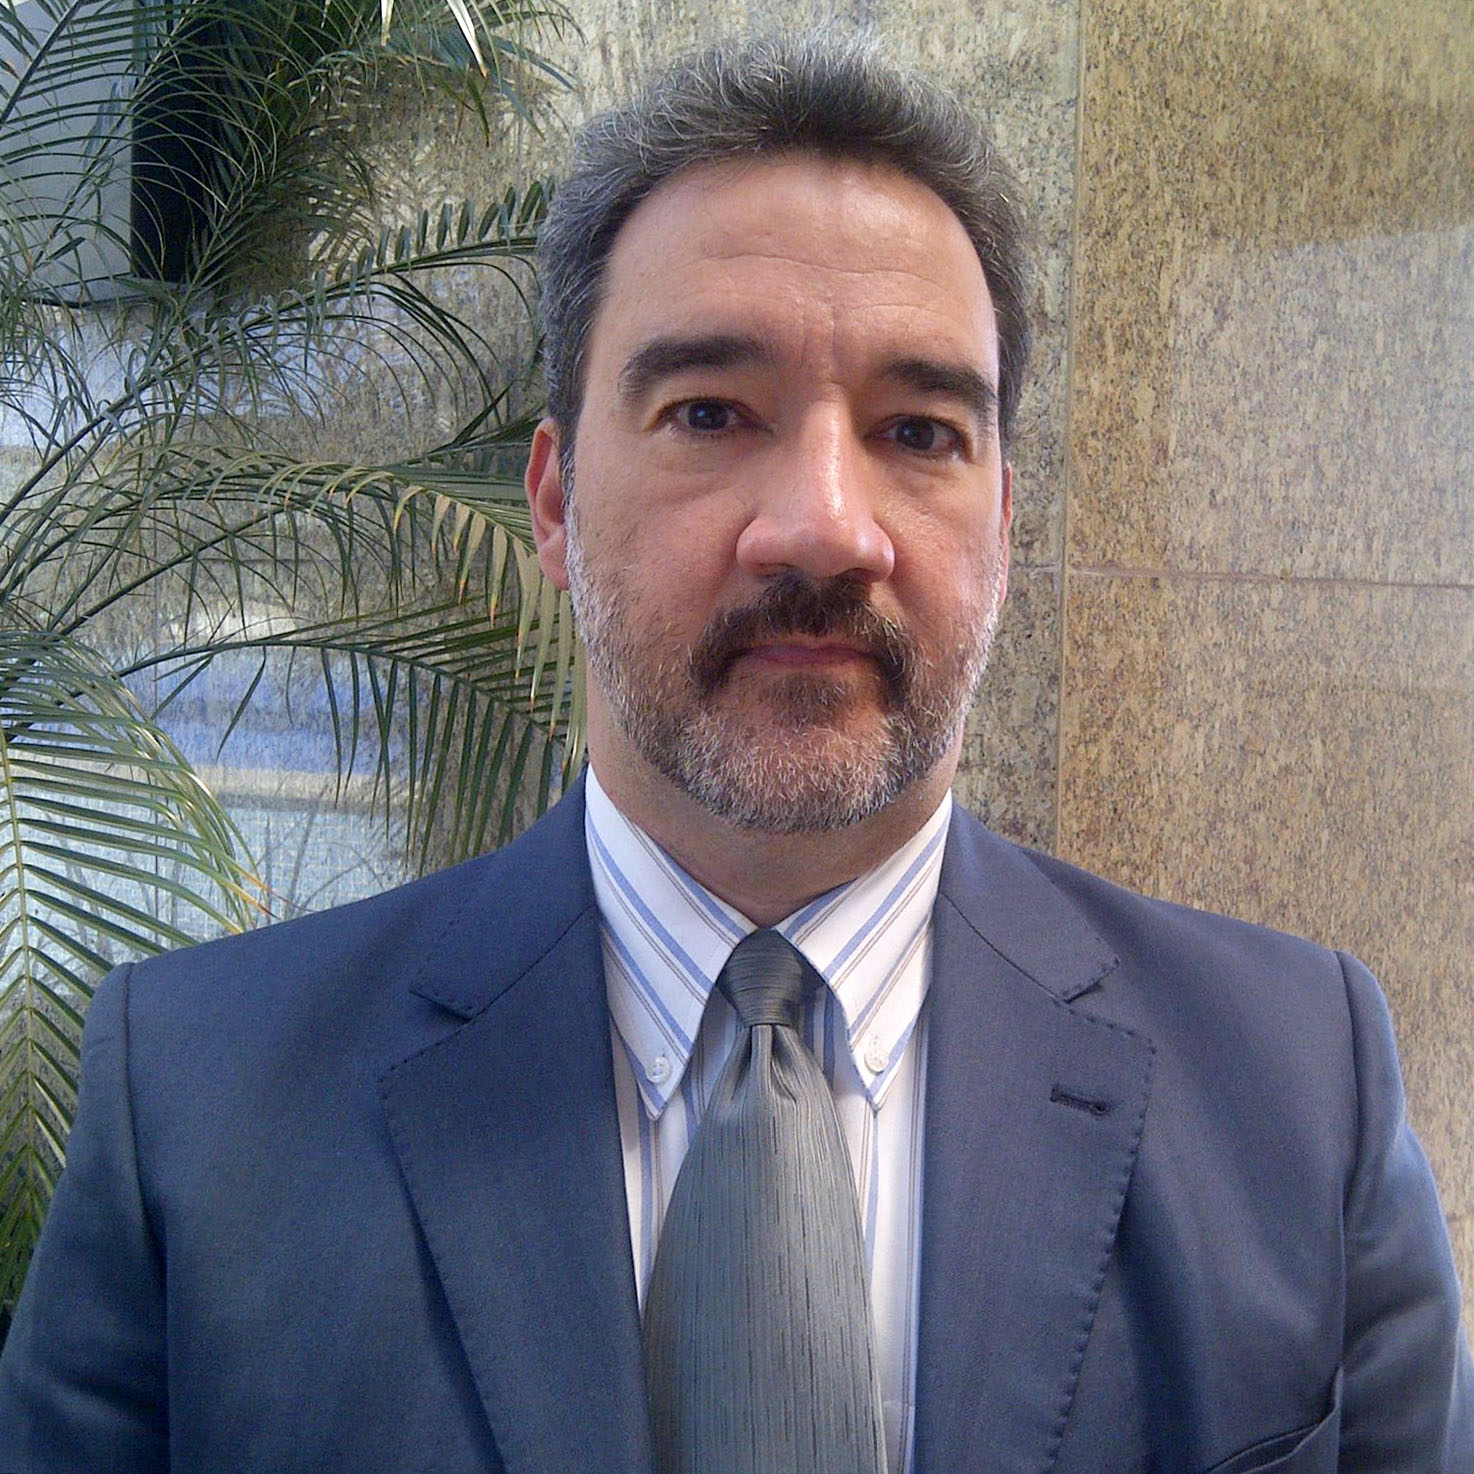 Annibal Affonso - Professor, Palestrante e Consultor Empresarial